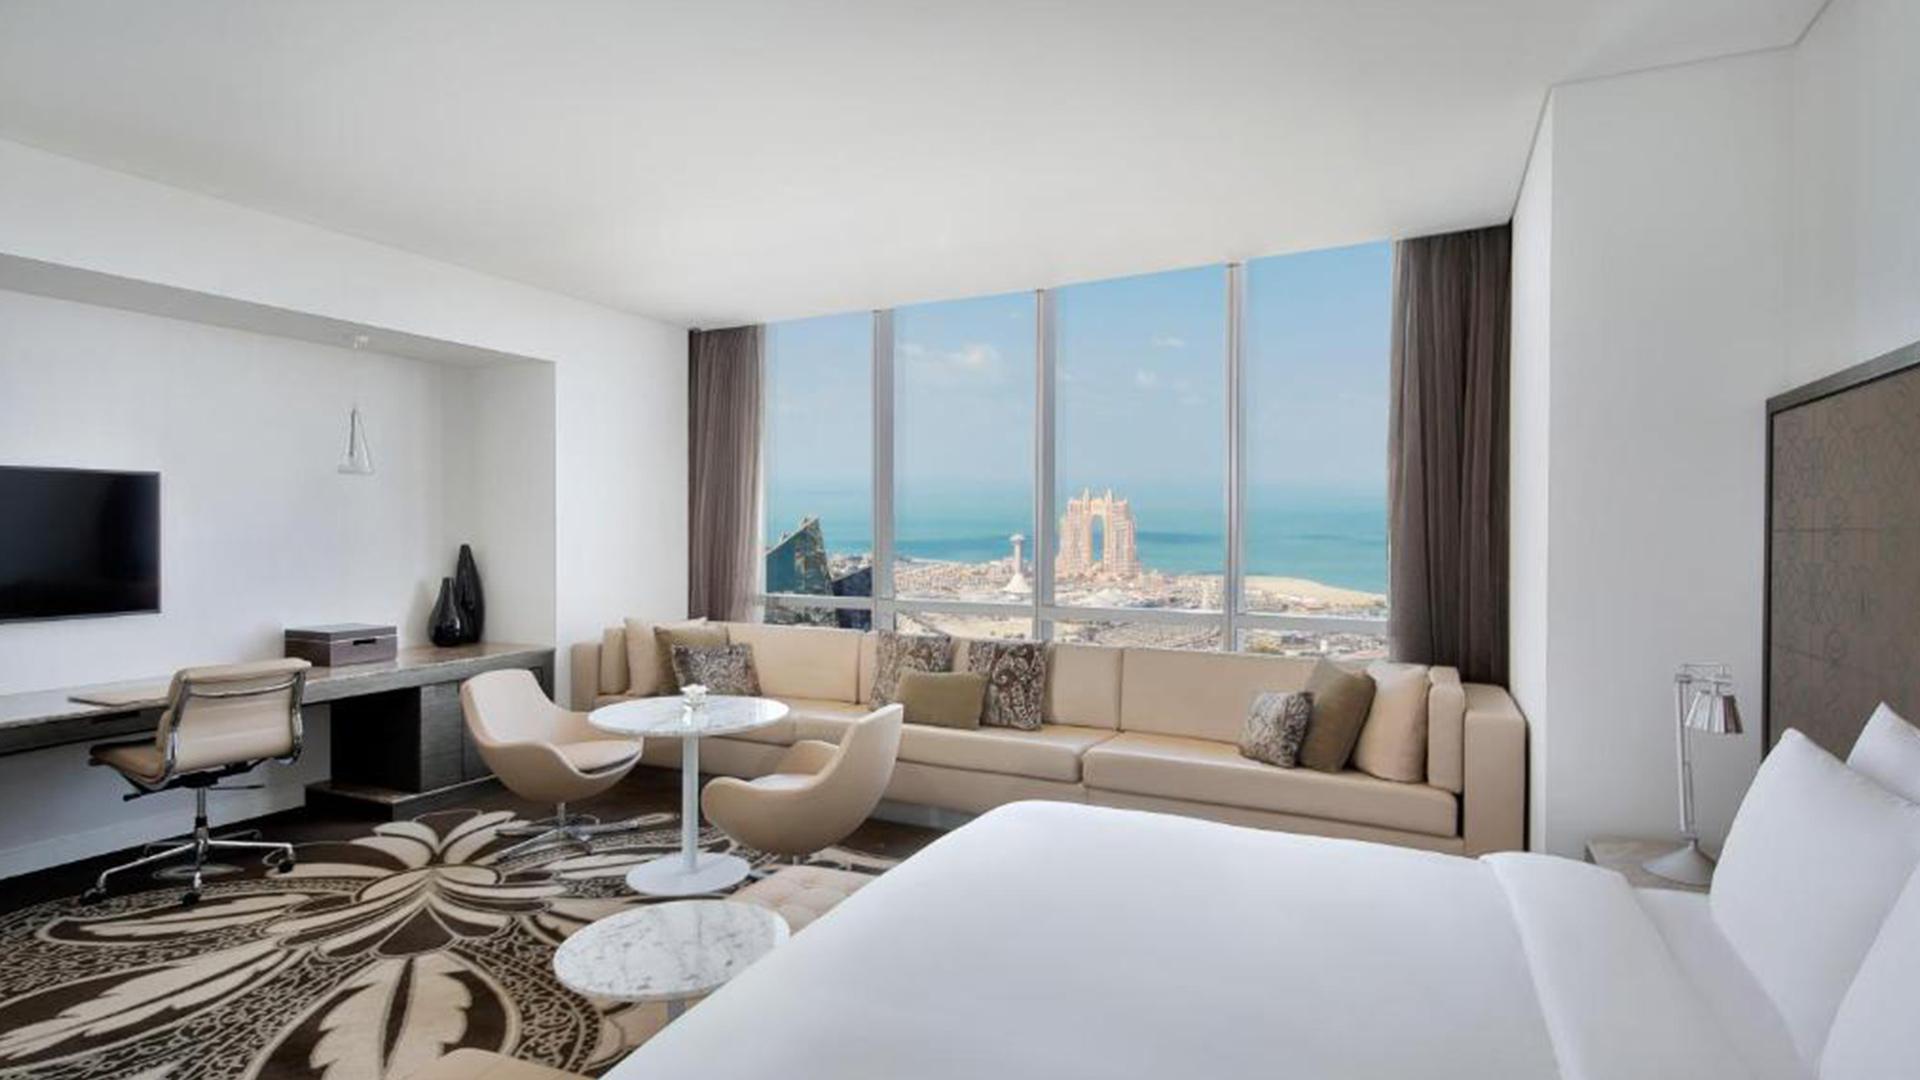 King Junior Suite with Sea View image 1 at Conrad Abu Dhabi Etihad Towers by null, Abu Dhabi, United Arab Emirates